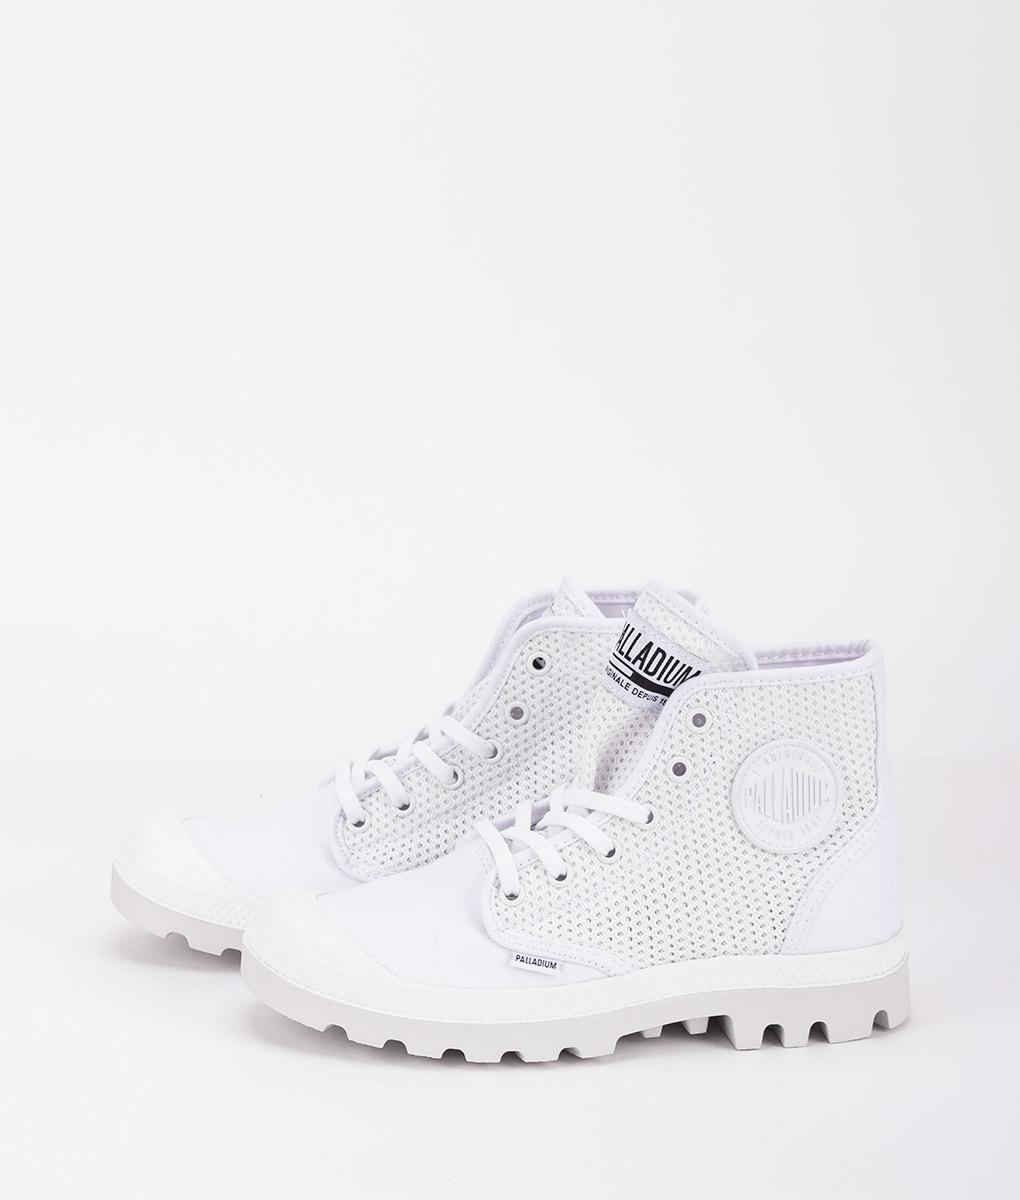 1549a84265 PALLADIUM Women Sneakers 75751 PAMPA HI MESH, White | T6/8